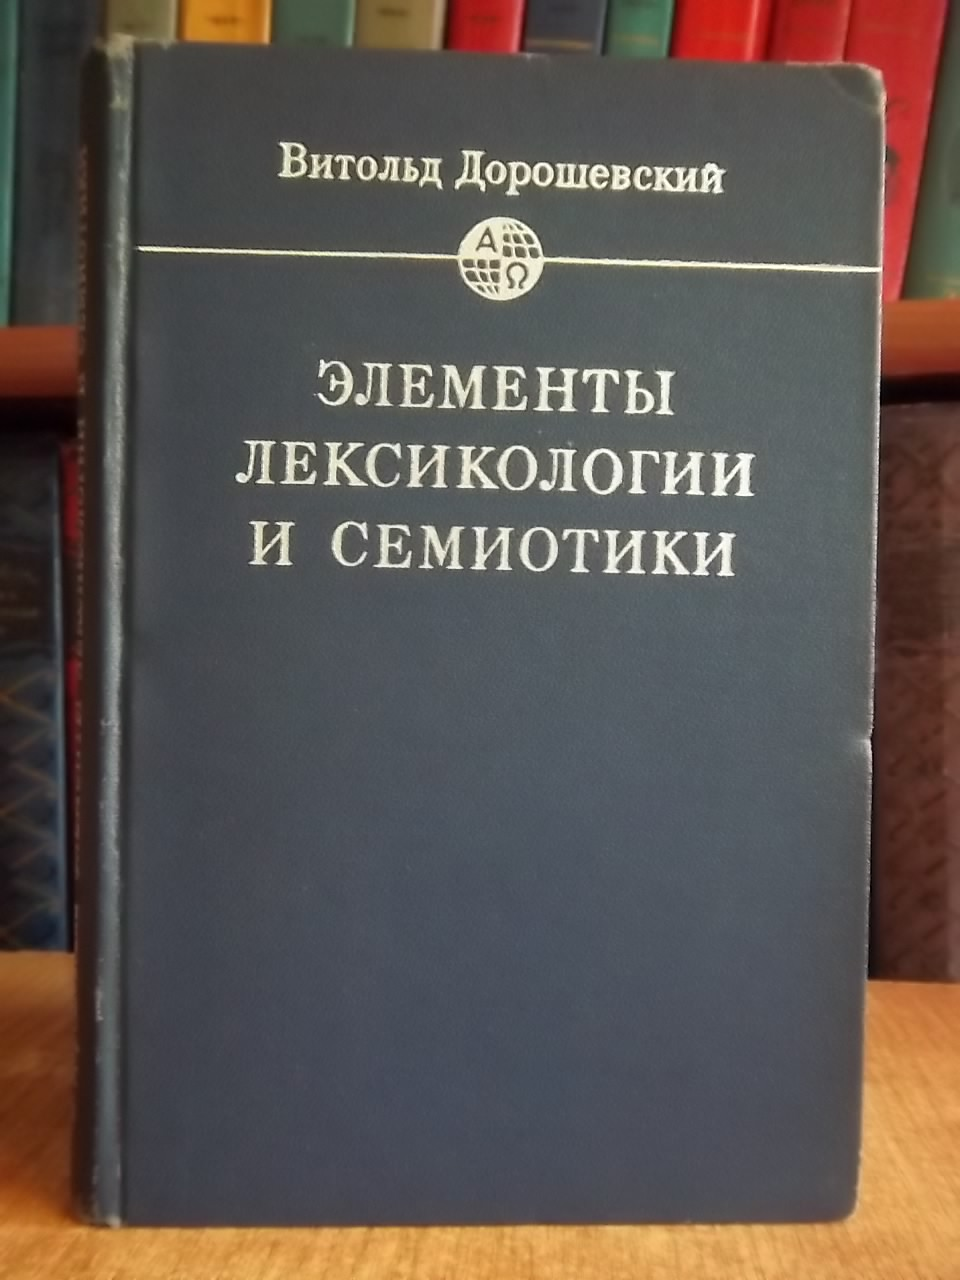 Элементы лексикологии и семиотики